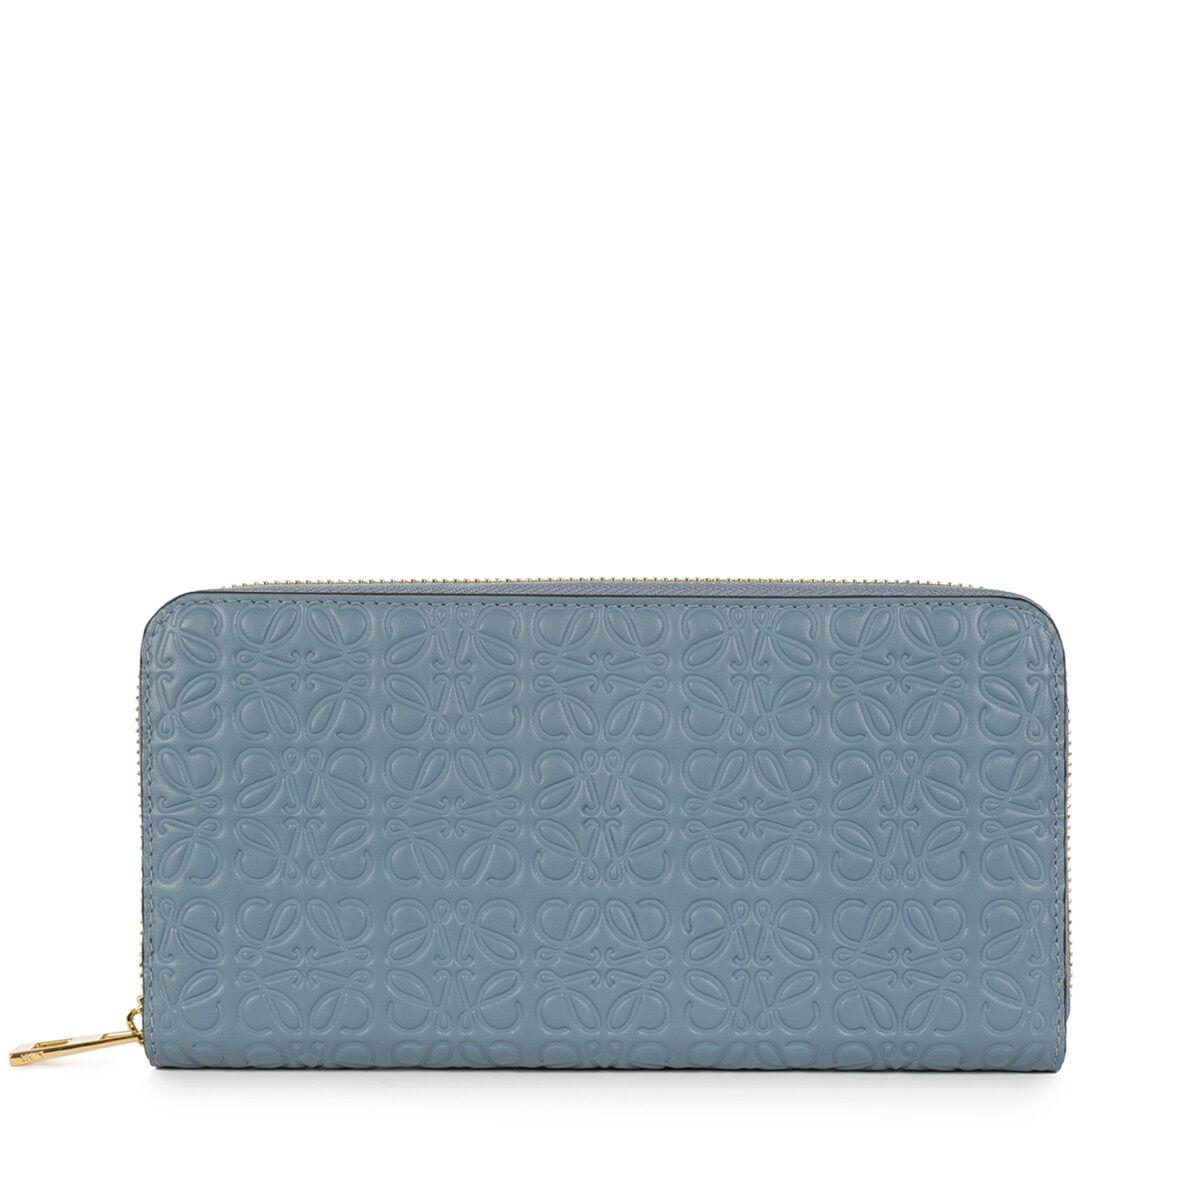 LOEWE Zip Around Wallet Stone Blue all